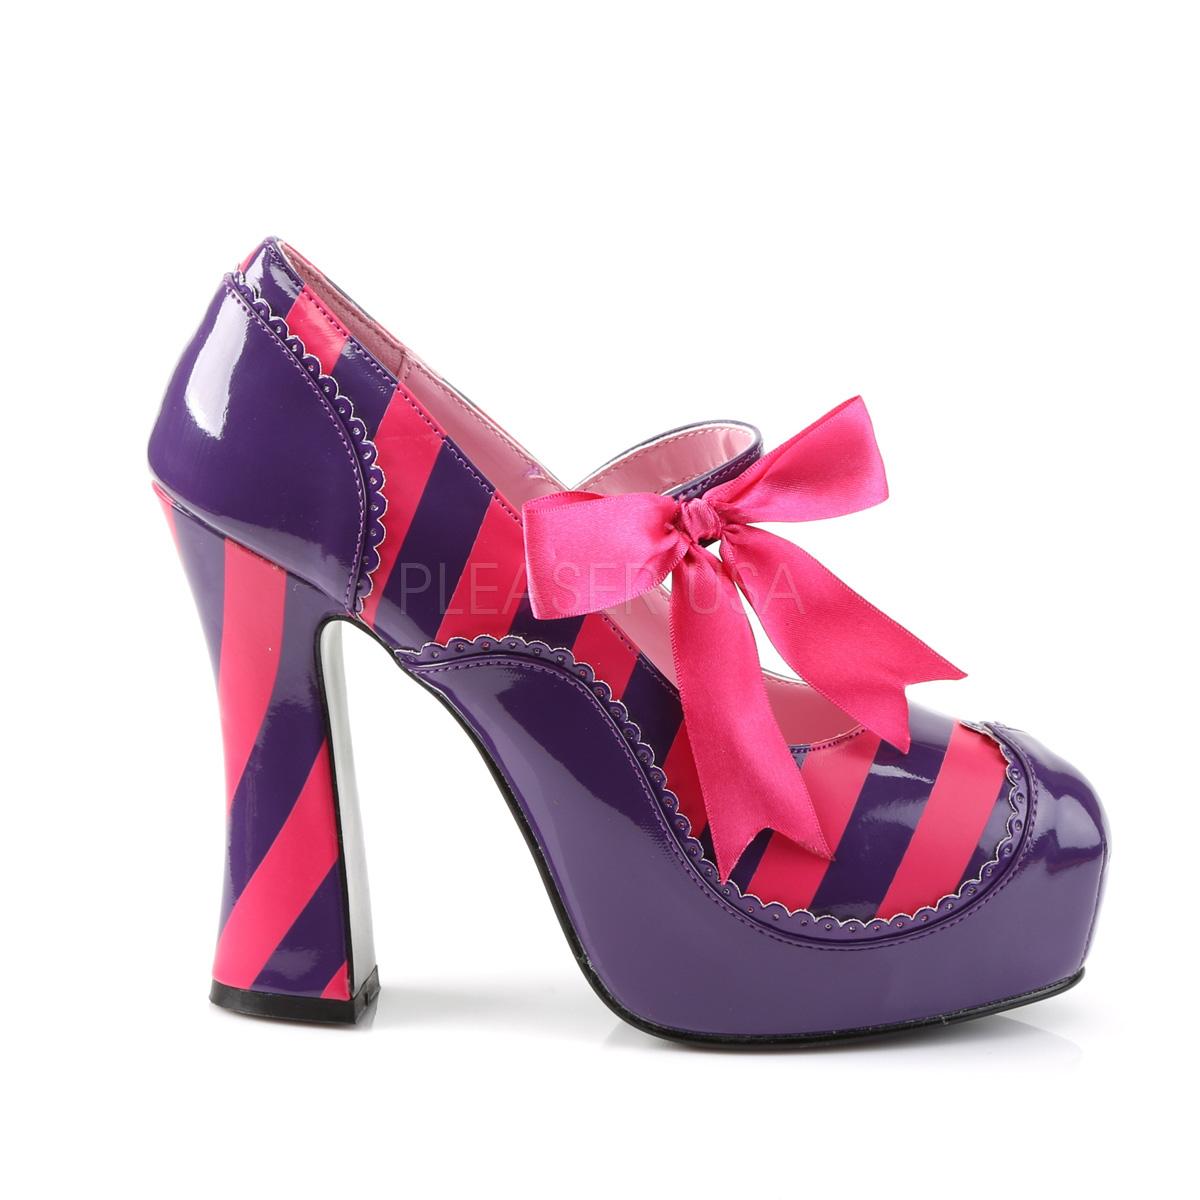 Funtasma KITTY-32 5inch Heel, 1 1/4inch PF Striped Chunky Heel Shoe◆取り寄せ